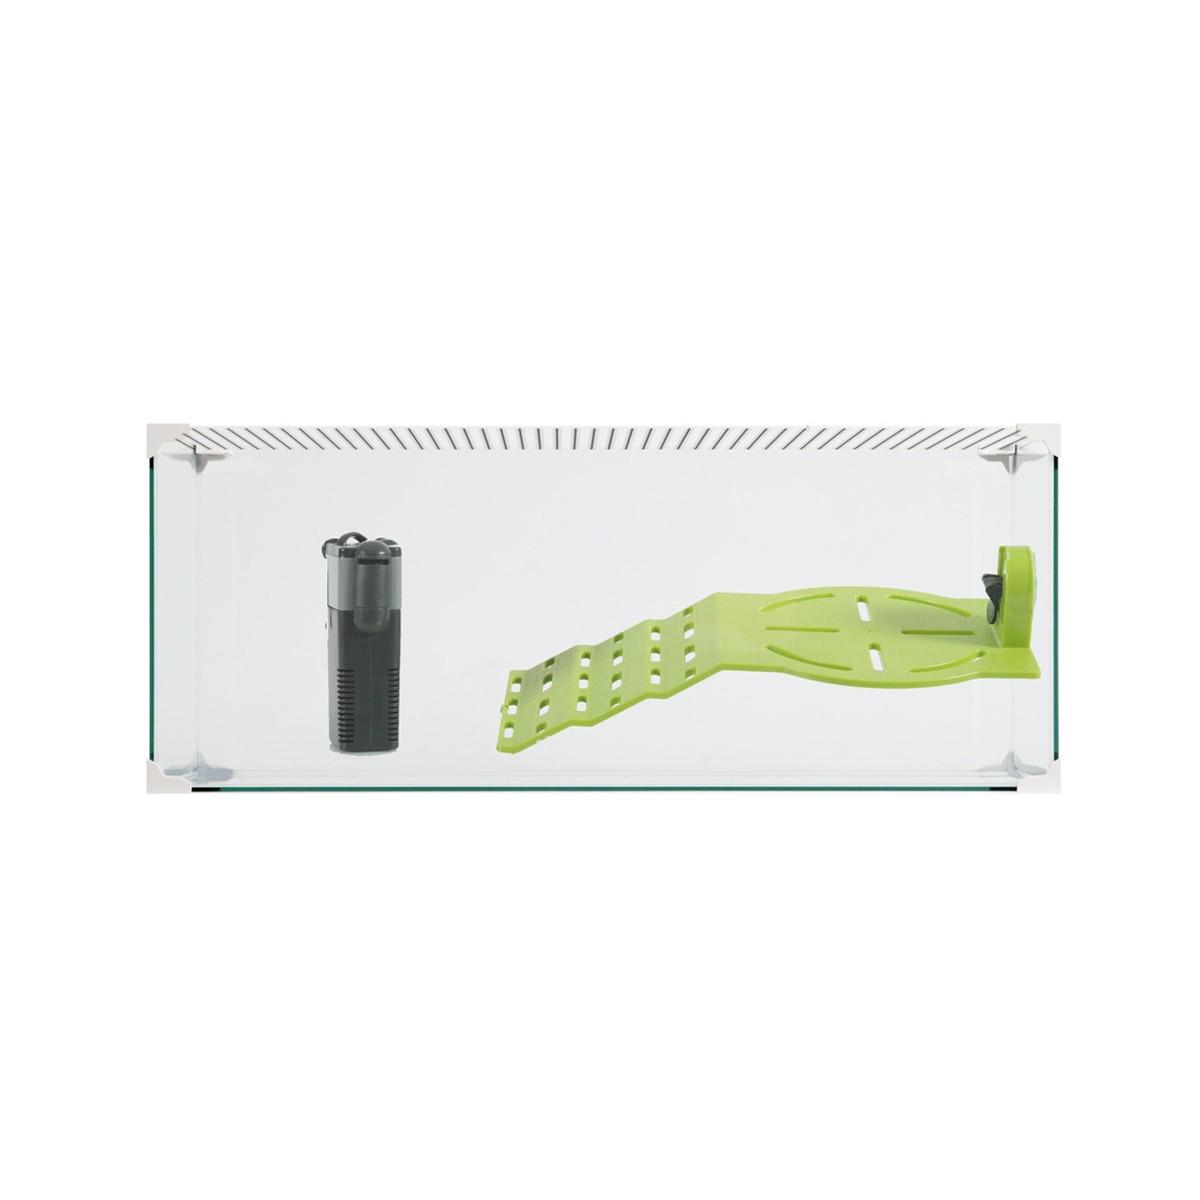 Tartarughiera Karapas Aqua Bianca 50 Cm